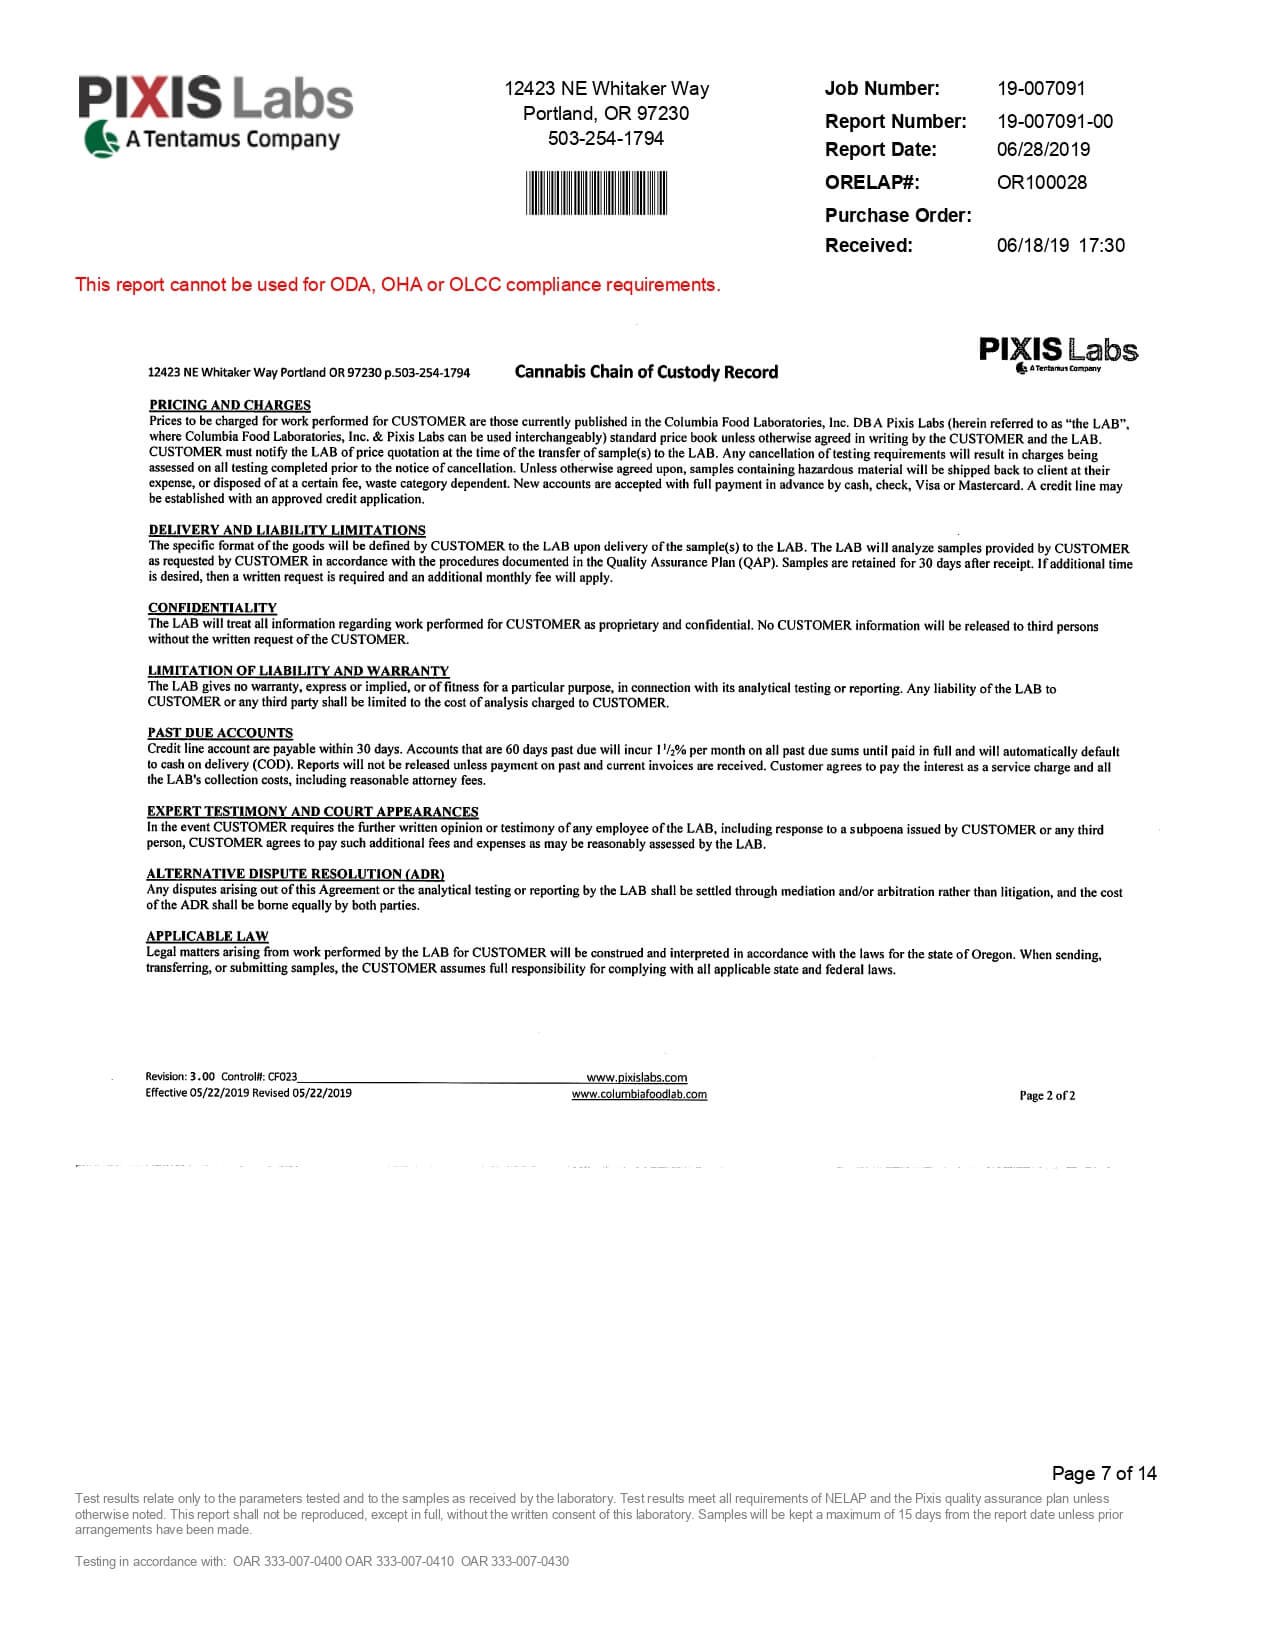 Select CBD Capsule Balance Soft Gel 2 Pack 33.3mg Lab Report